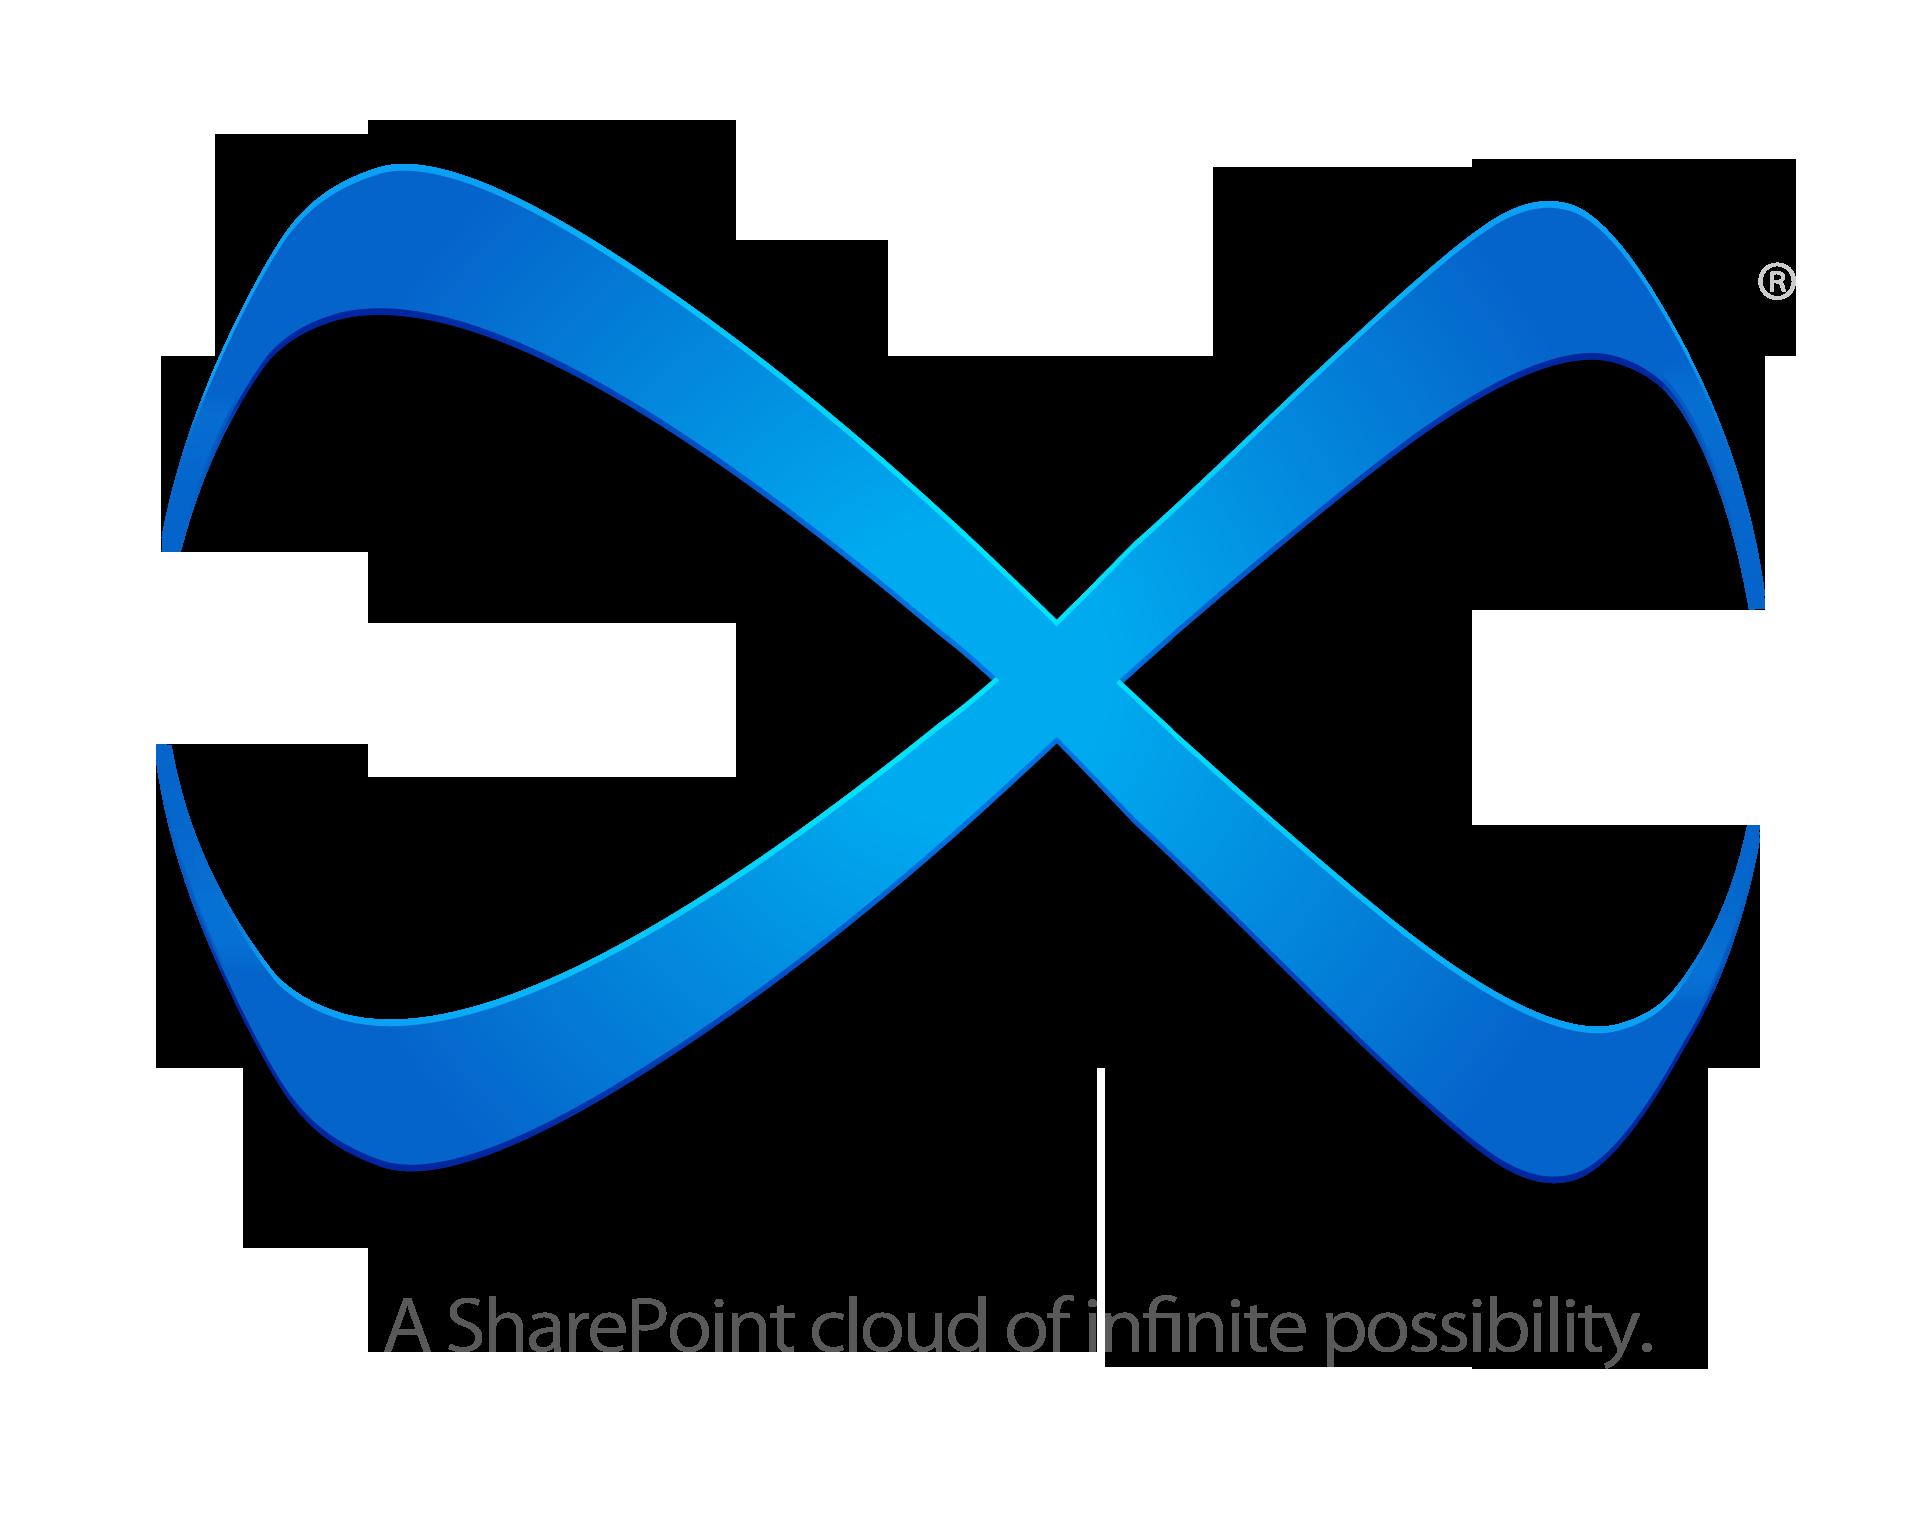 Infinix Symbol - Infinite Possibility Tagline